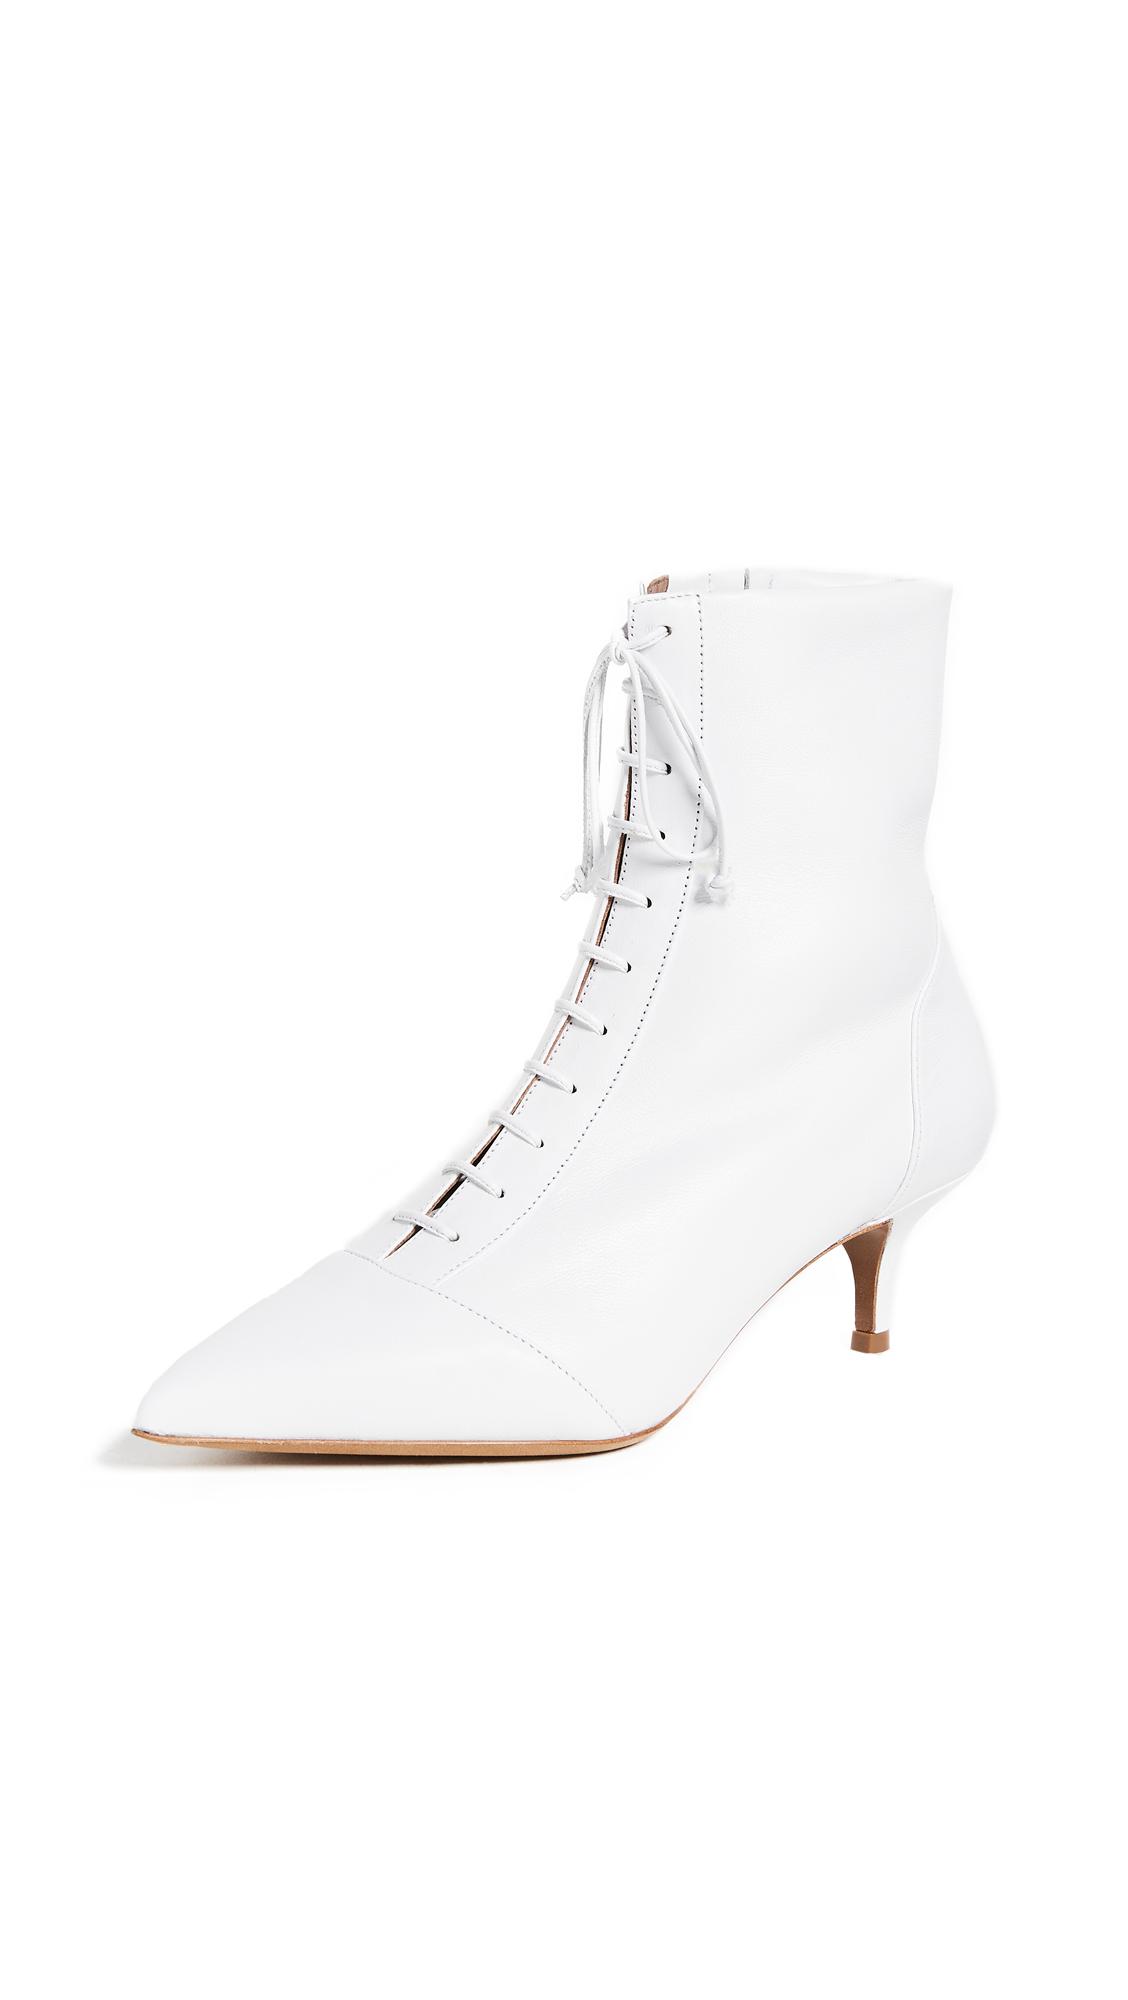 Tabitha Simmons Emmet Kitten Heel Booties - White